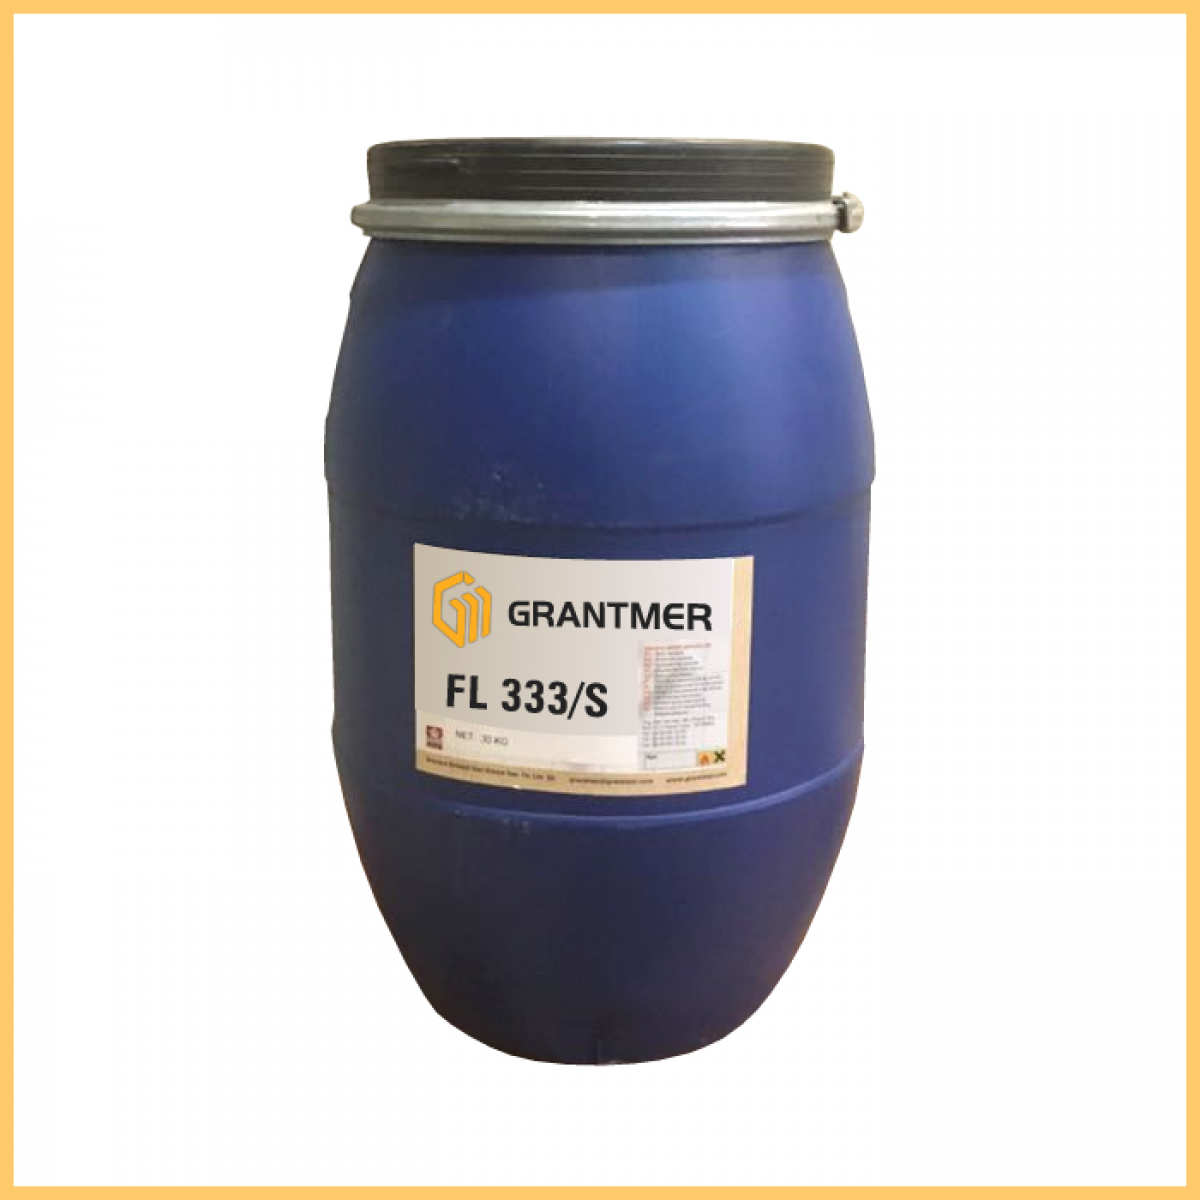 GRANTMER FL 333/S